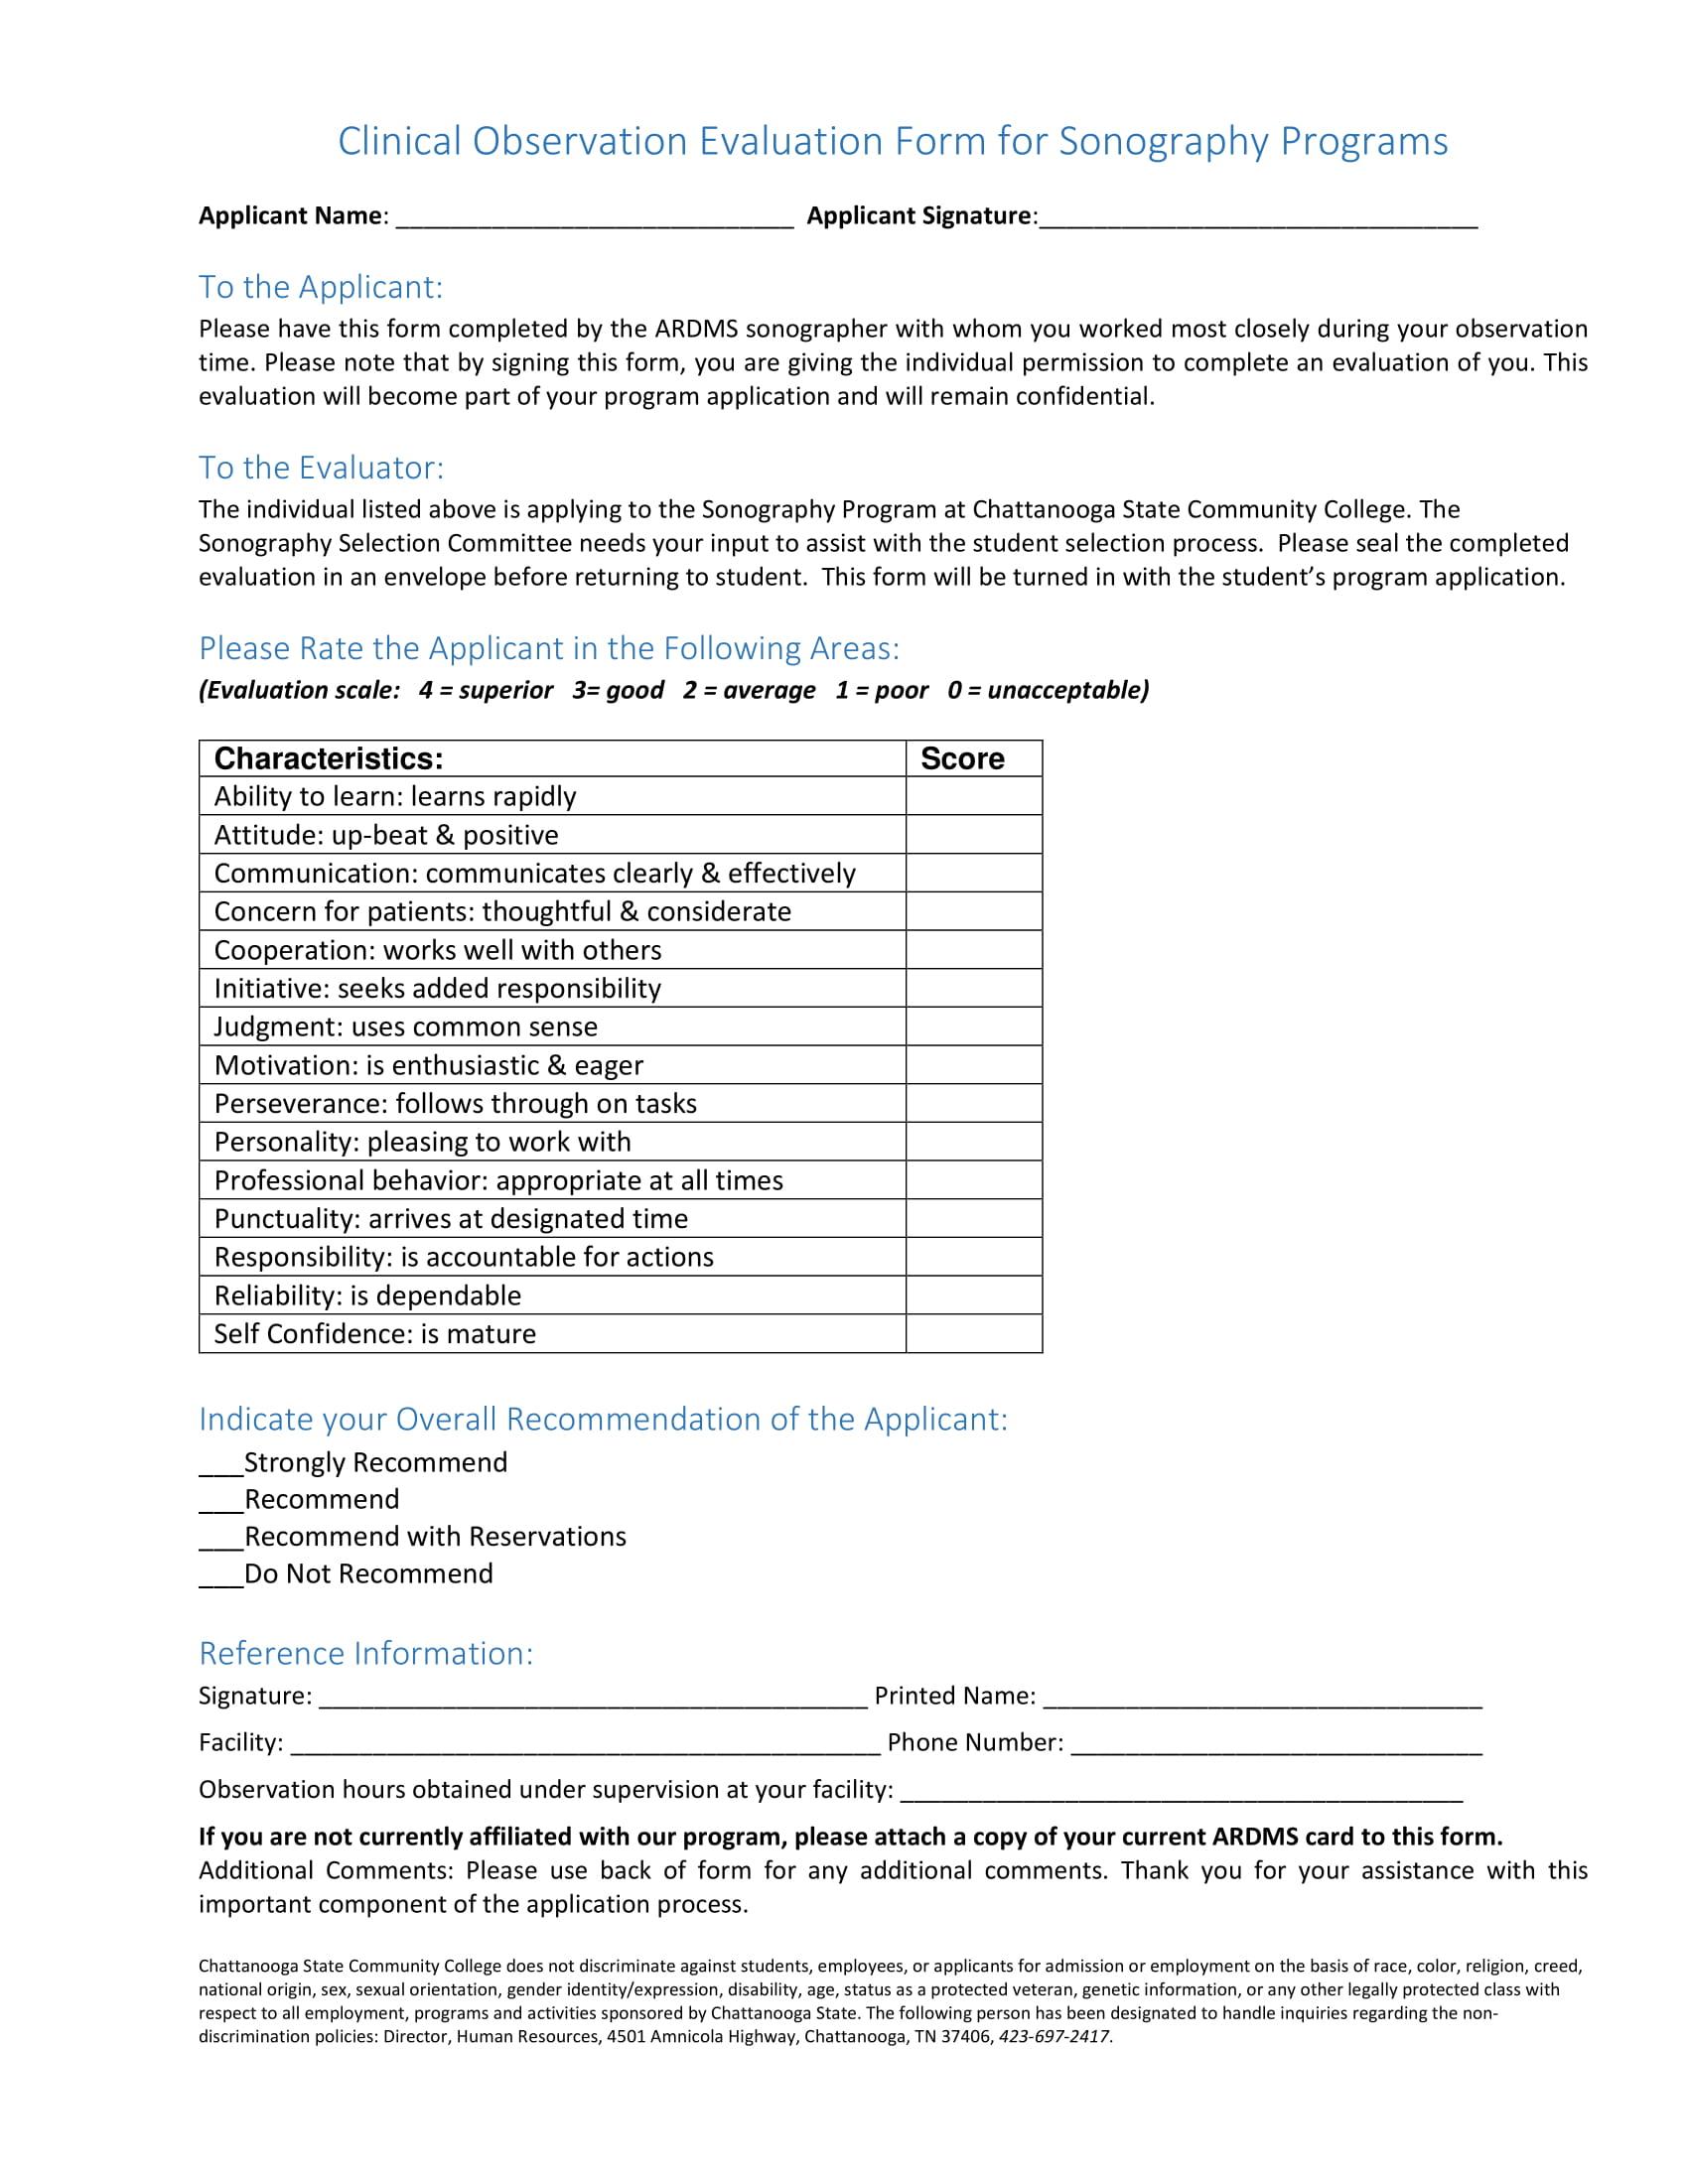 clinical observation evaluation form 1